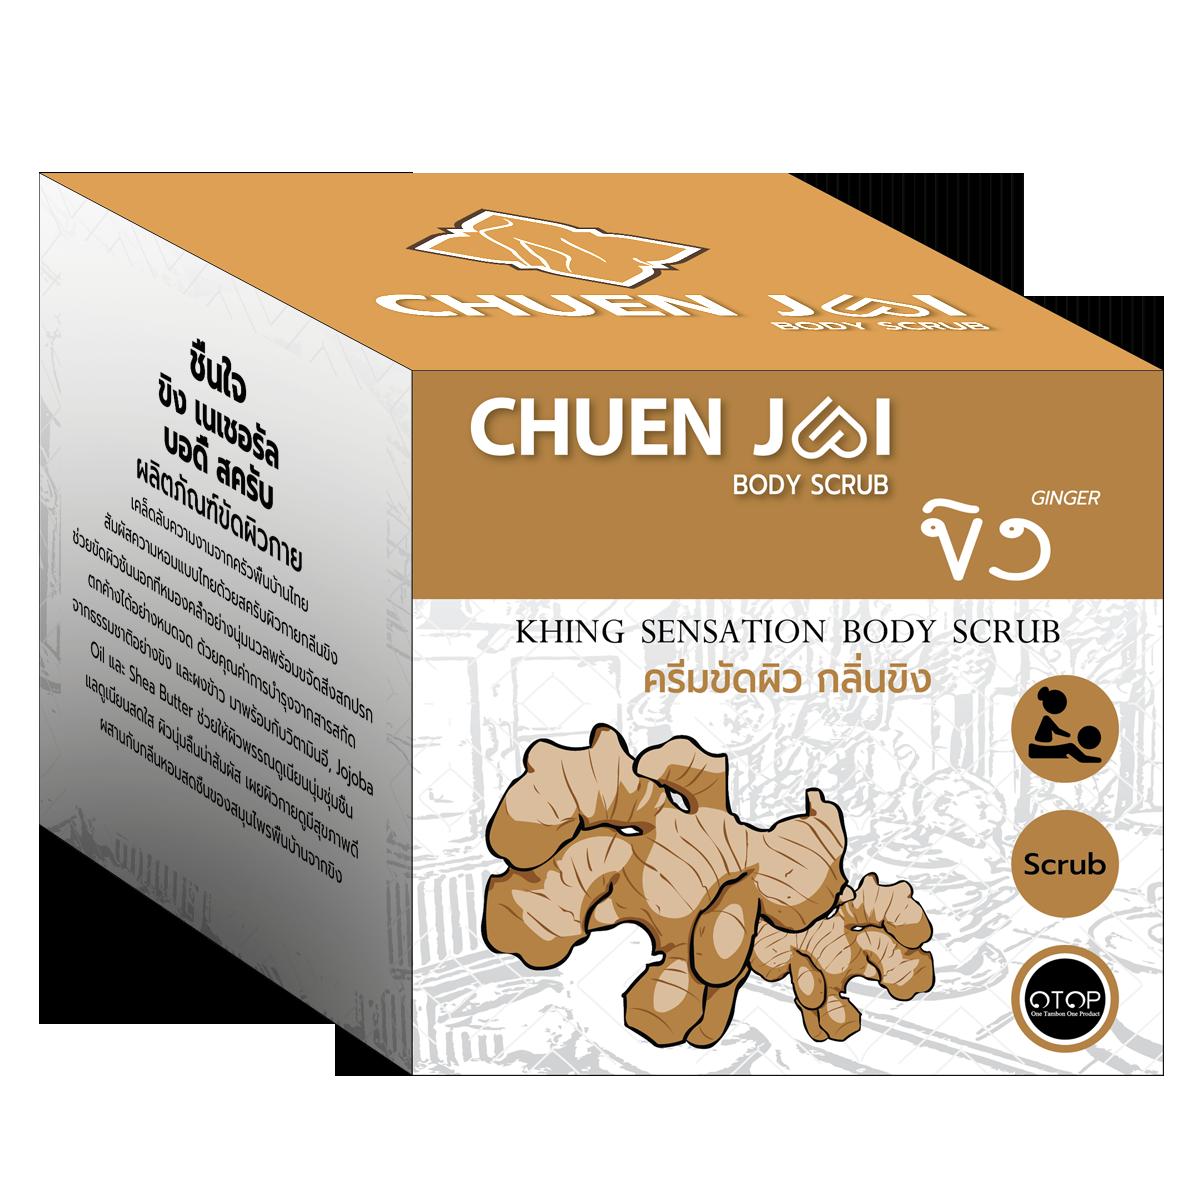 XBD 193 CHUEN JAI KHING NATURAL BODY SCRUB